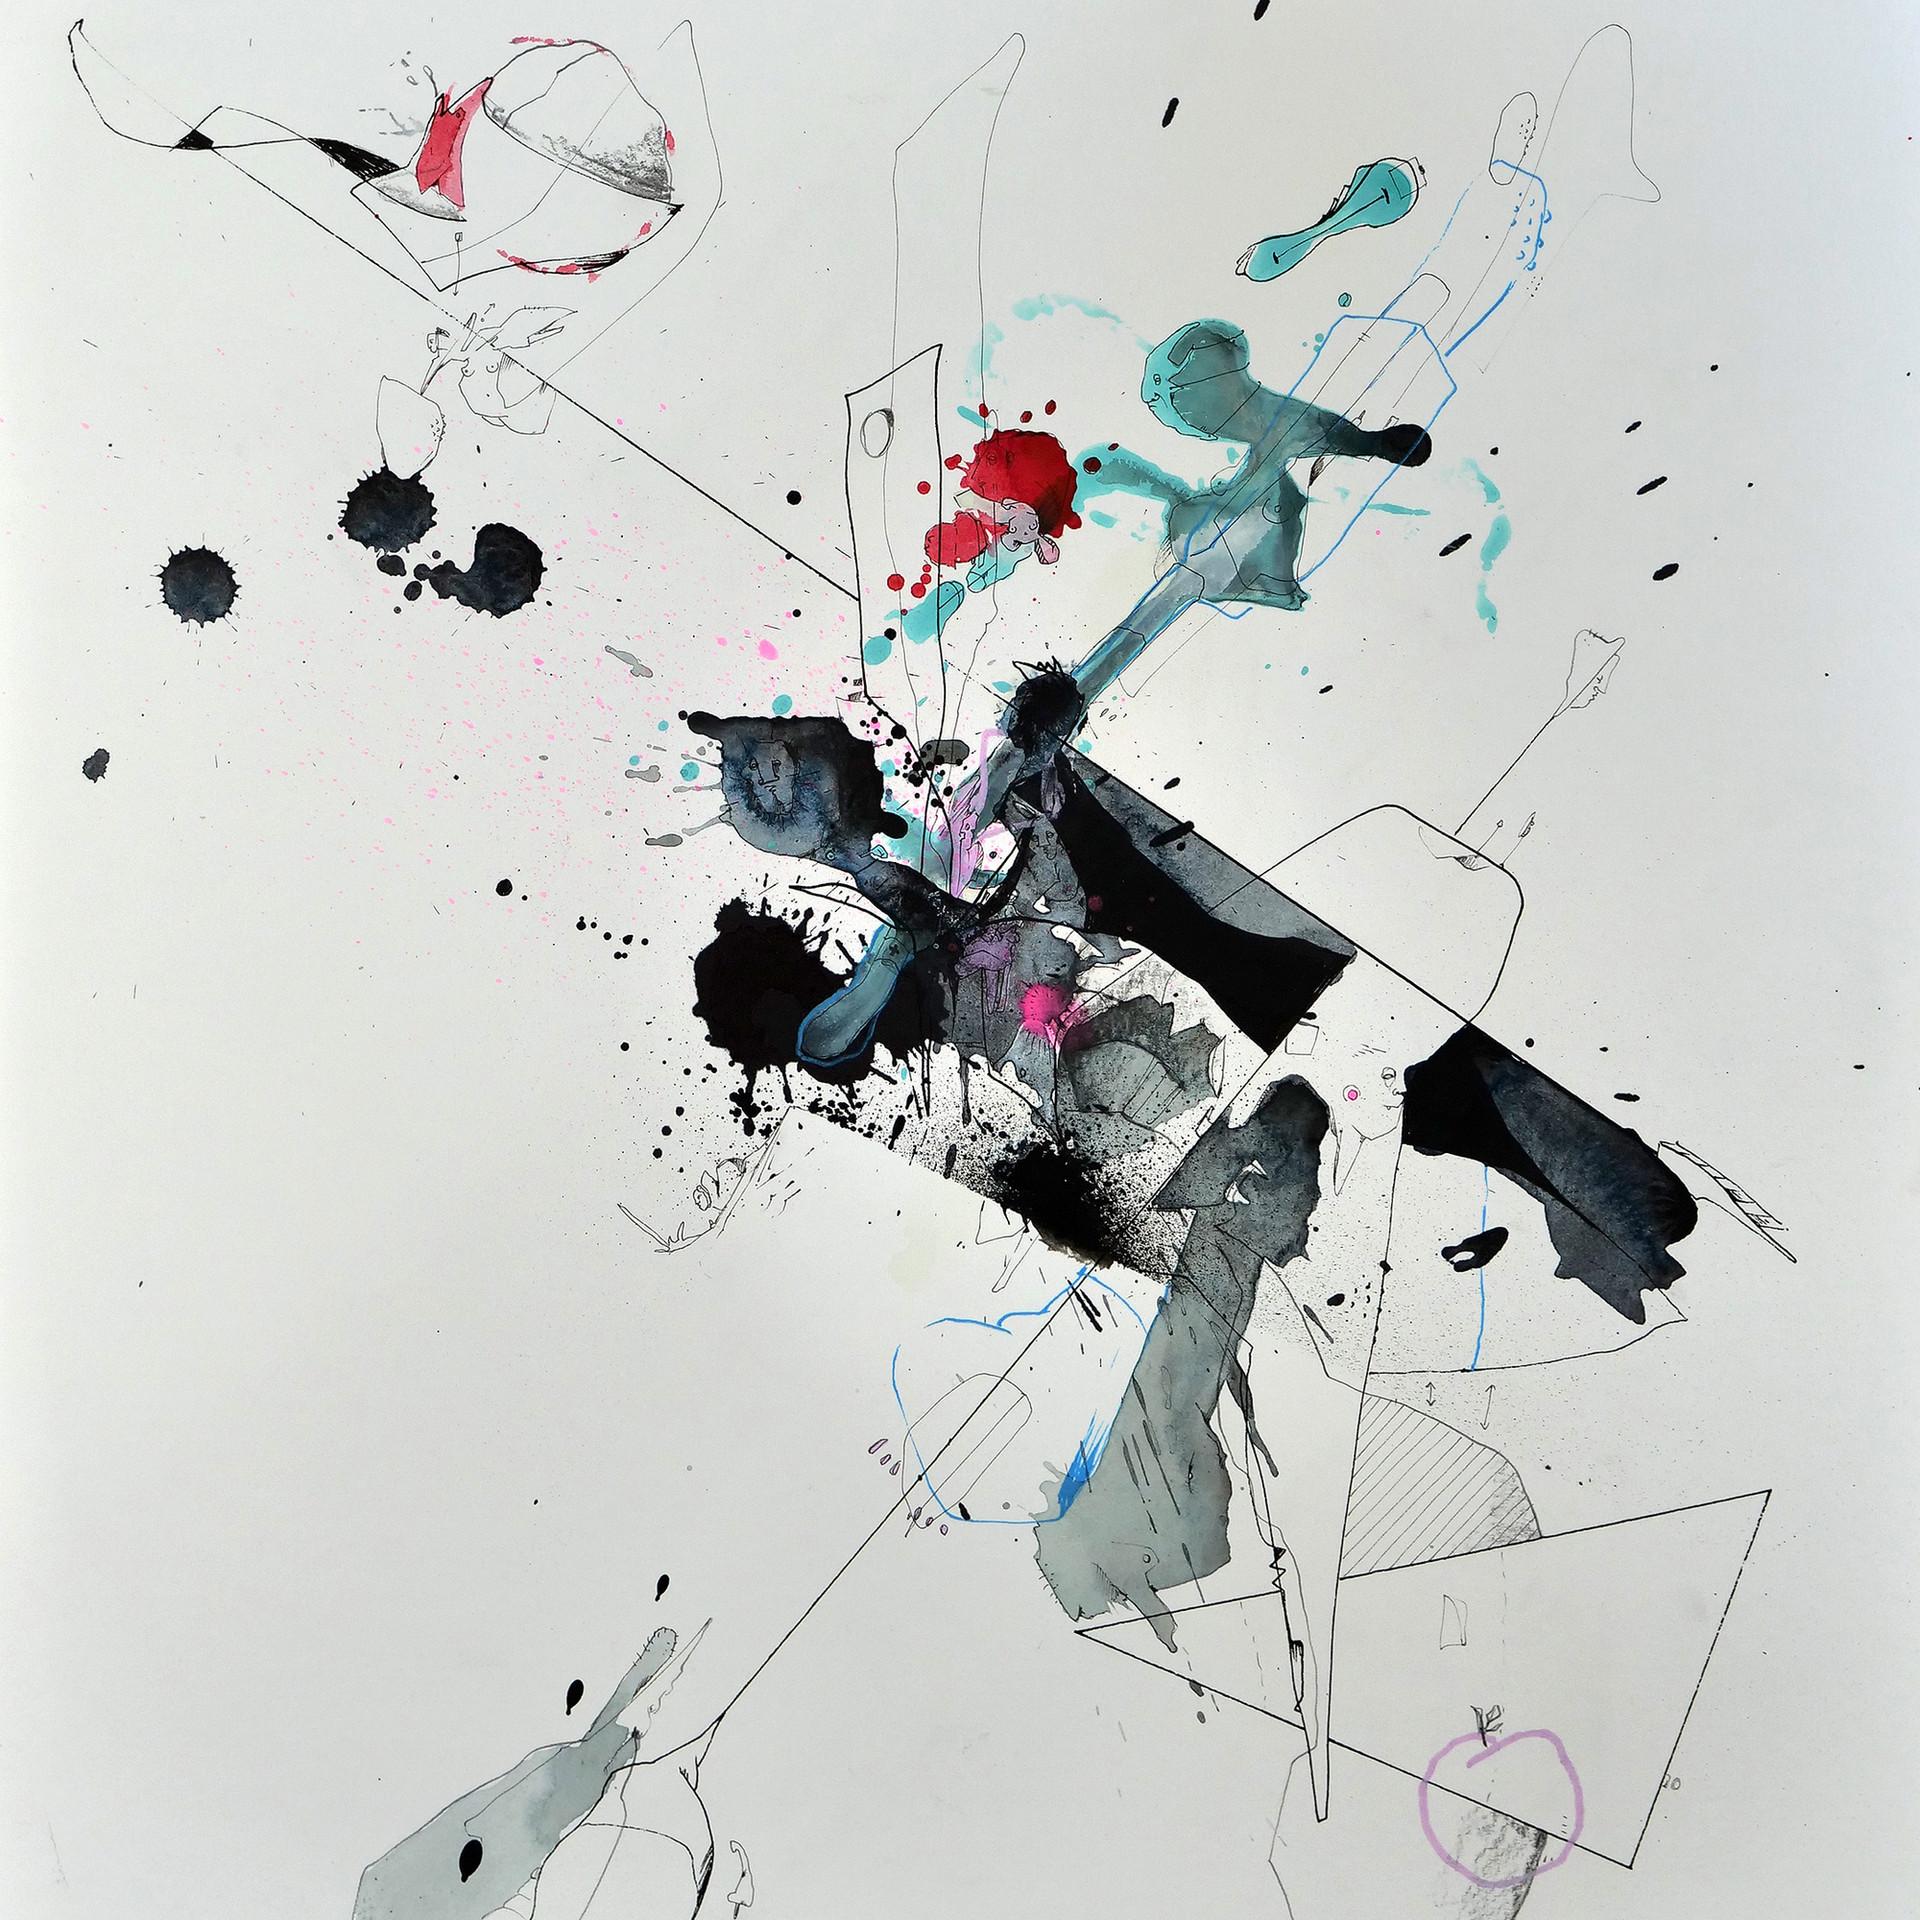 Inklusion 2018 Aquarell, Acryl, Pigmenttinte auf Papier 50 x 40 cm